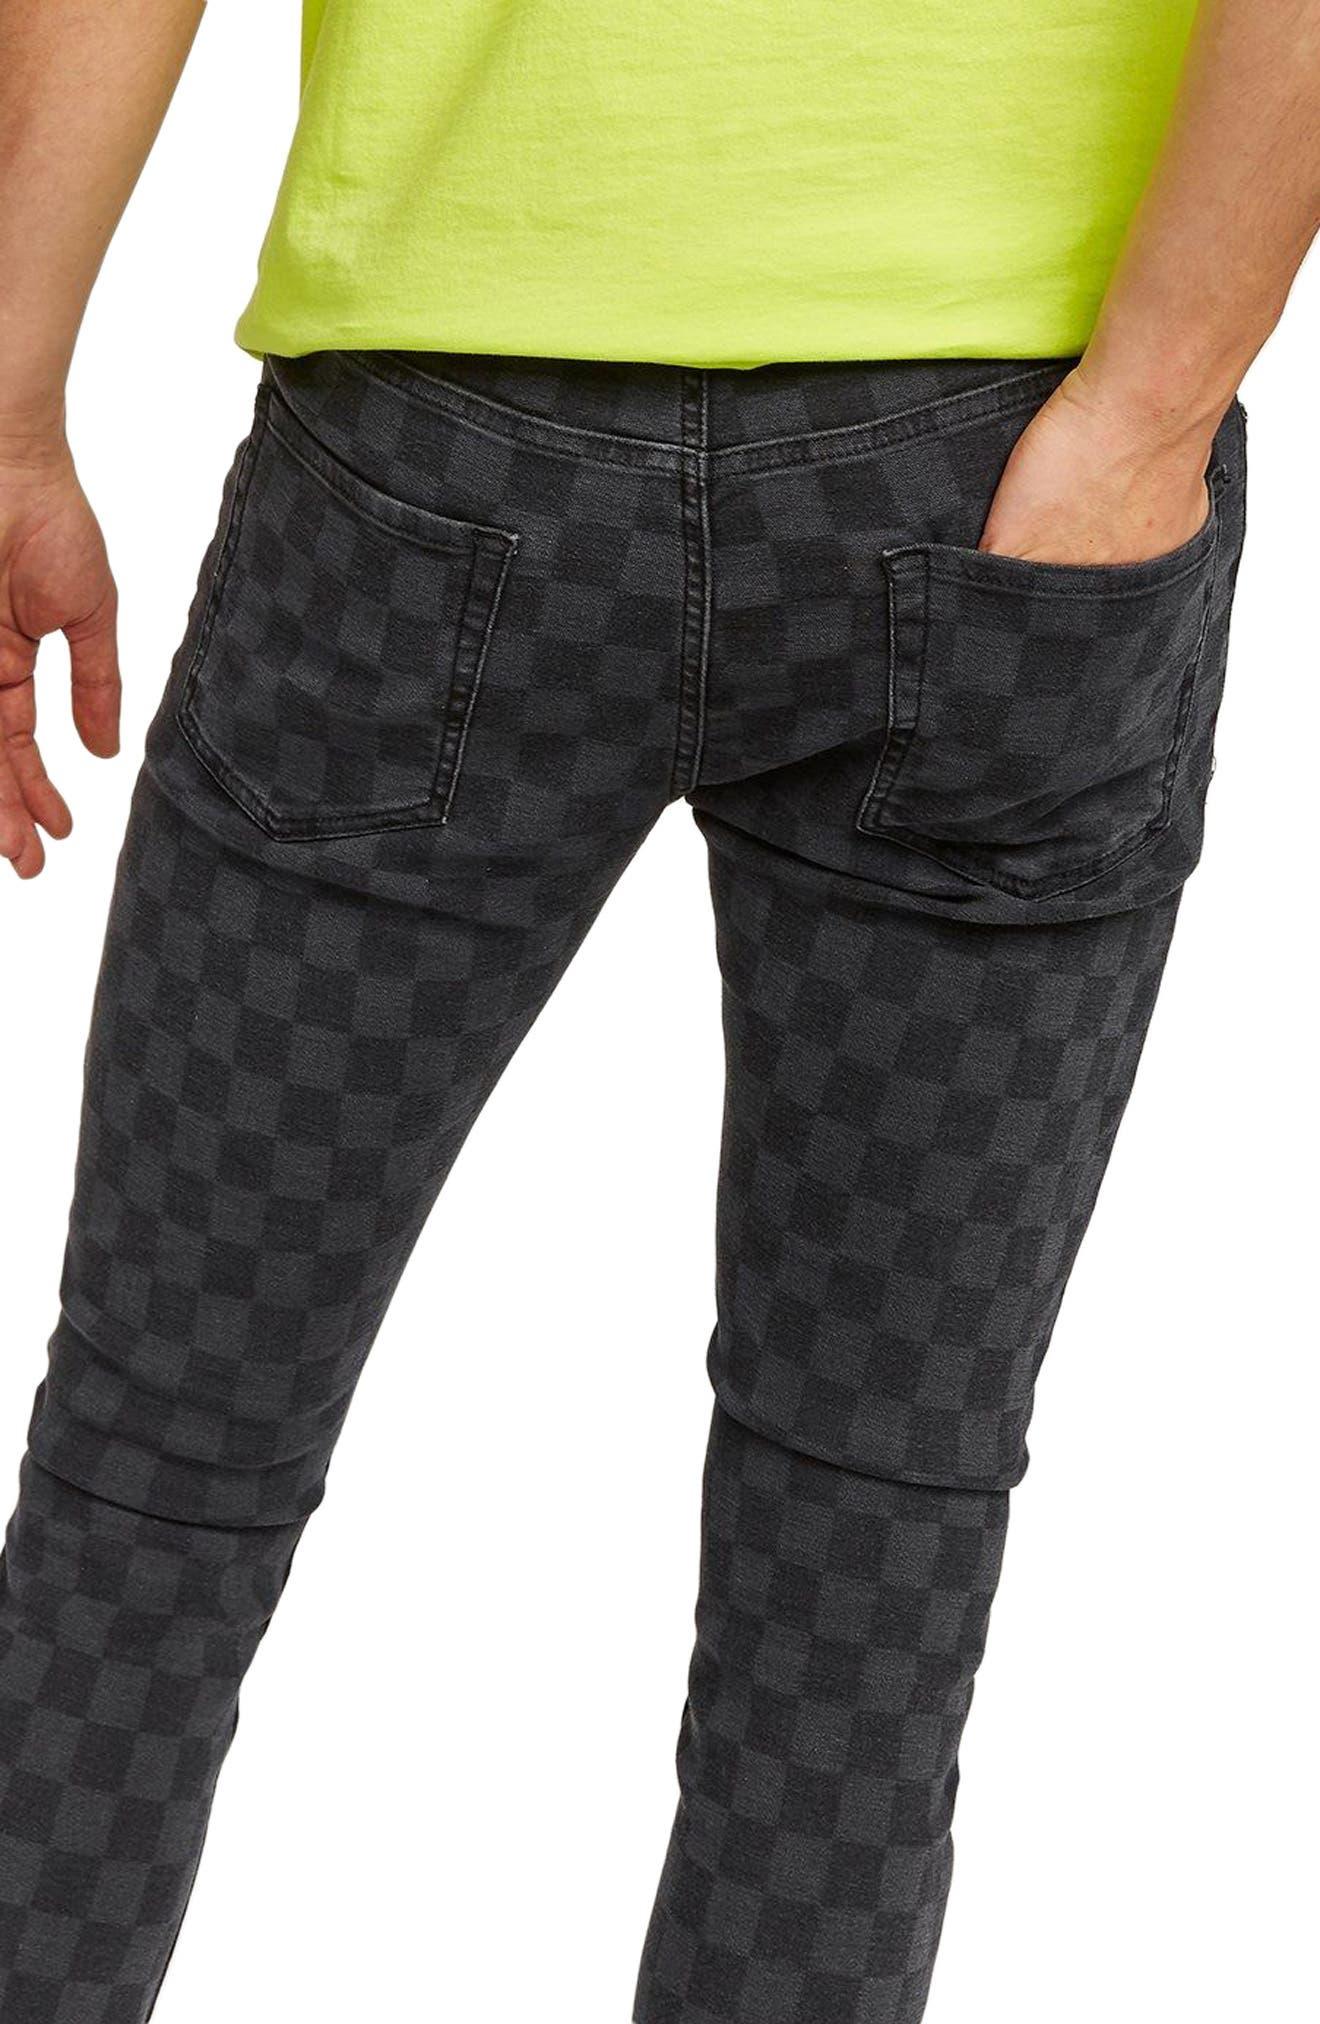 Check Stretch Skinny Fit Pants,                             Alternate thumbnail 3, color,                             Black Multi